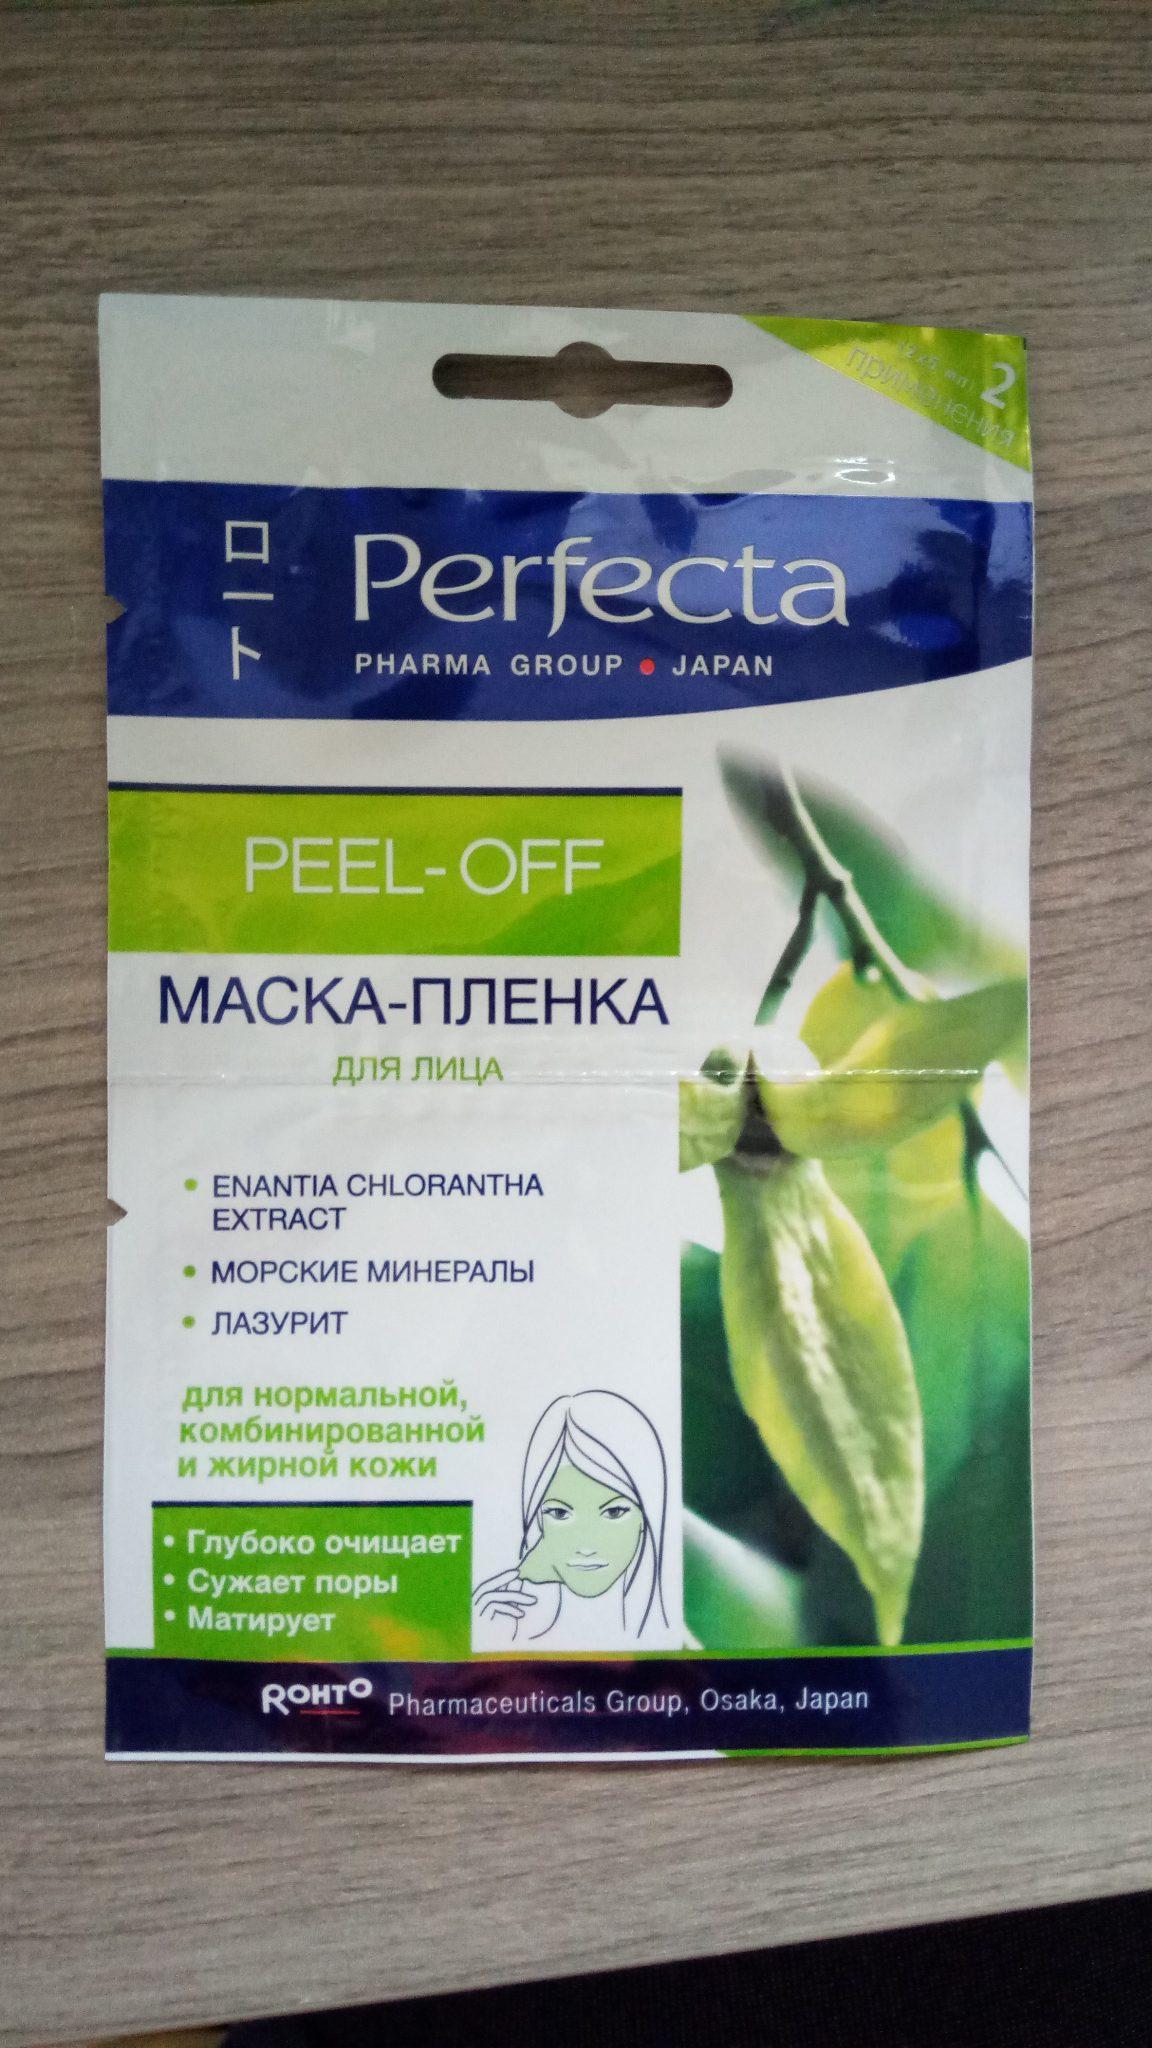 Маска для лица от Рerfecta peel off. отзыв.